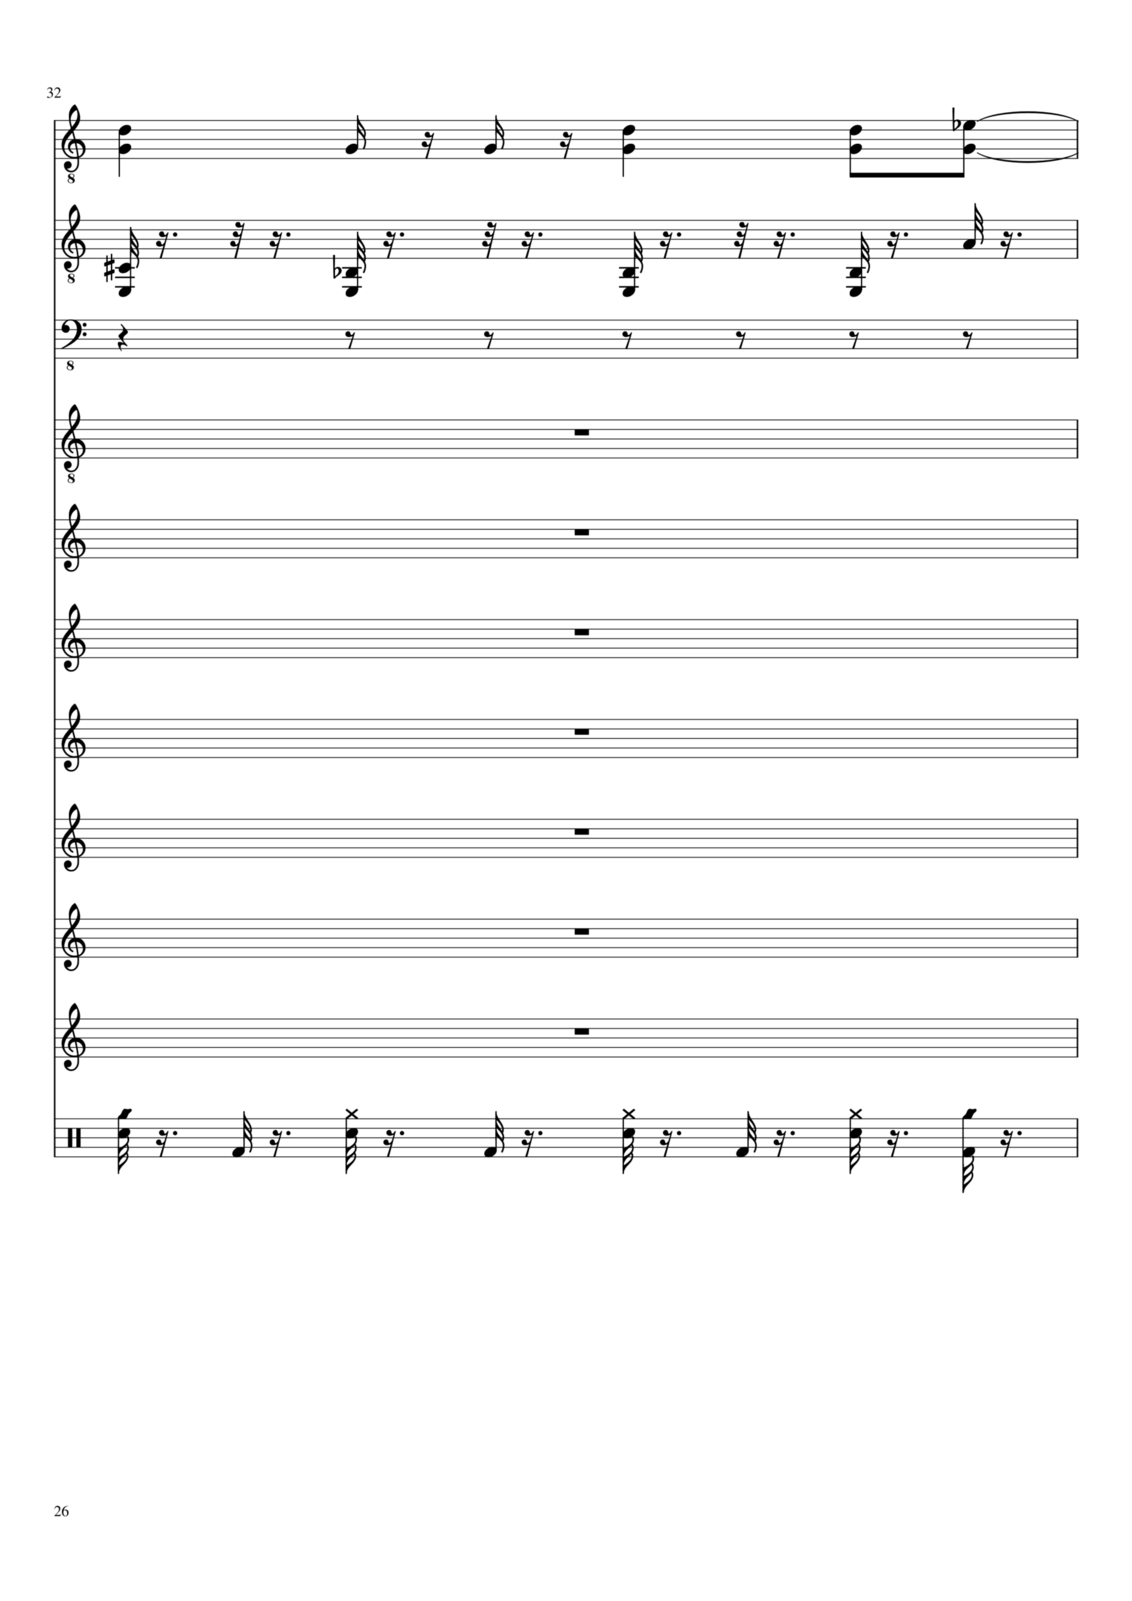 Belyiy sokol slide, Image 26